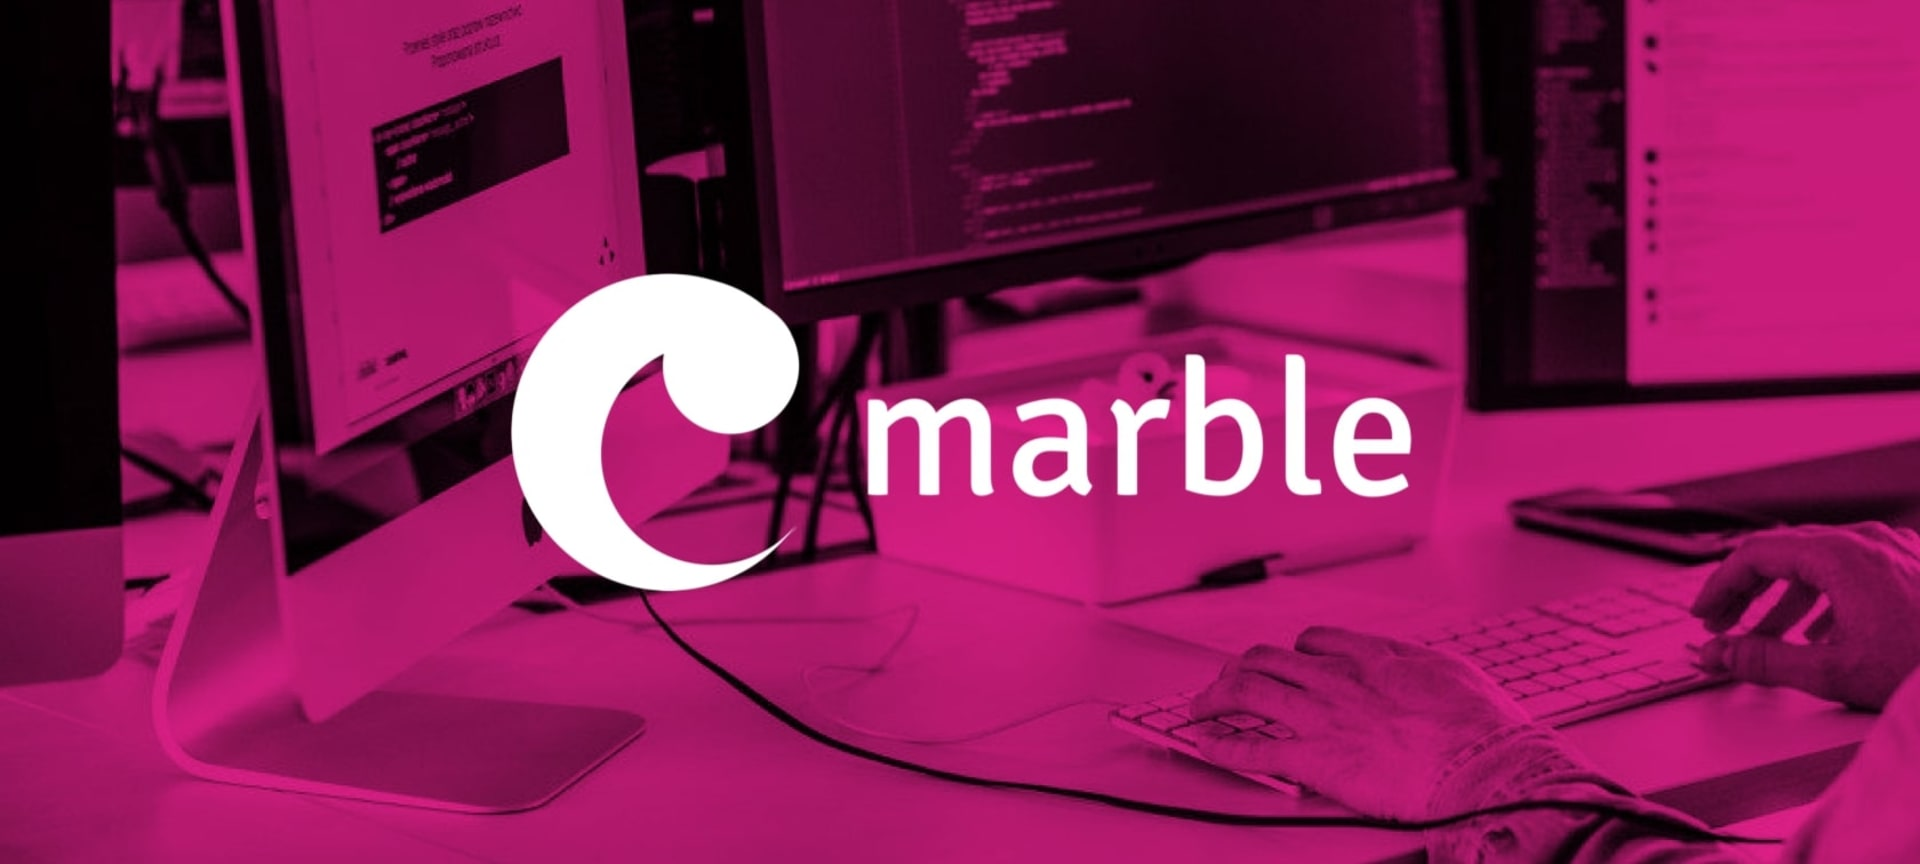 Marble.js – new open source framework for JavaScript